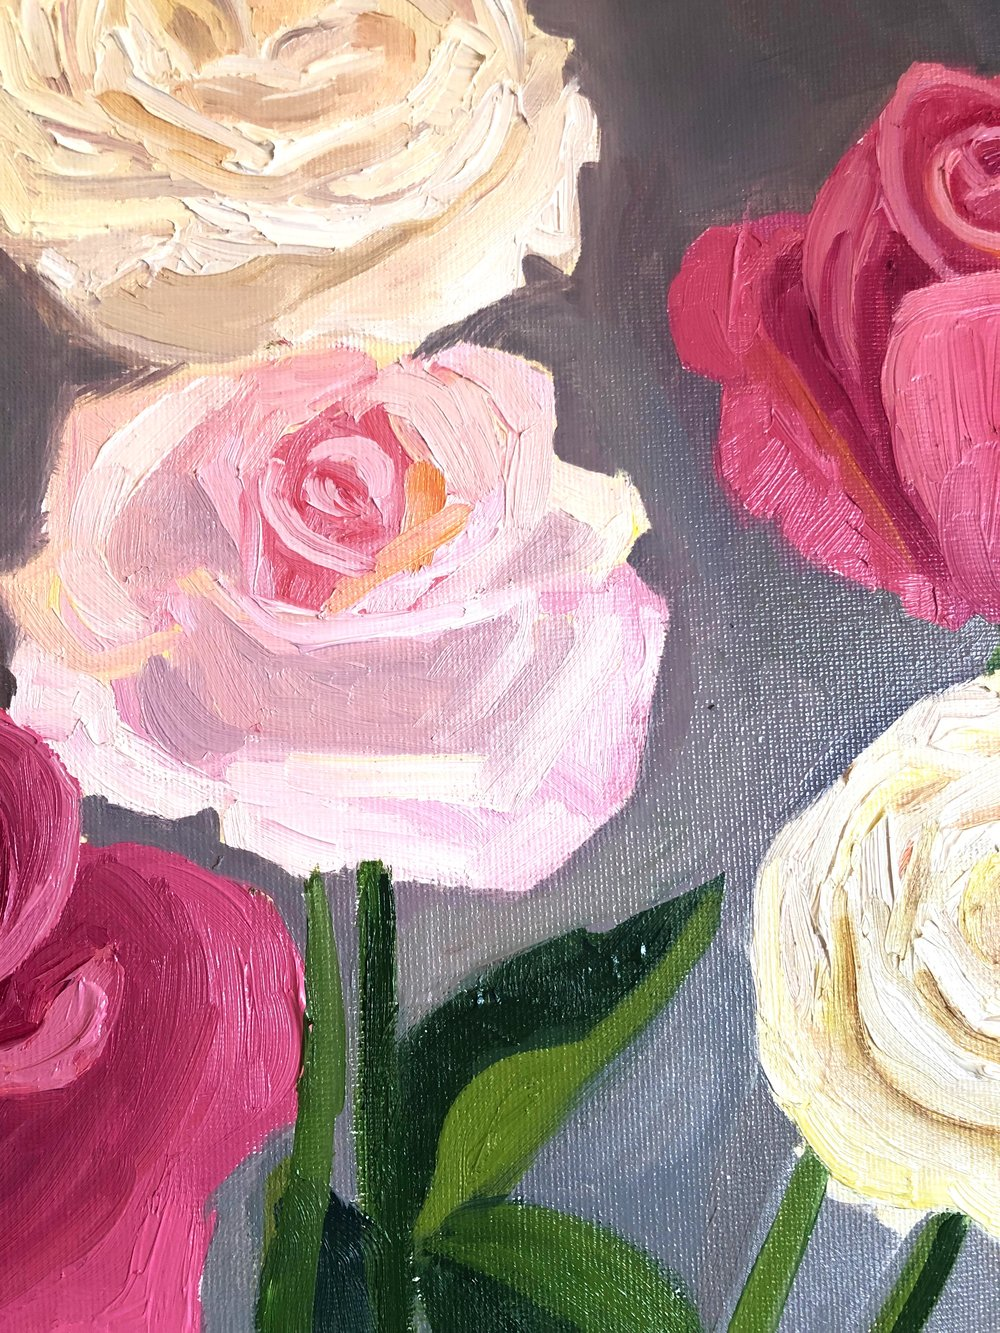 katrina-eugenia-philosophy-skincare-love-philosophy-amazing-grace-amazing-grace-ballet-rose-live-painting-oil-painting13.JPG